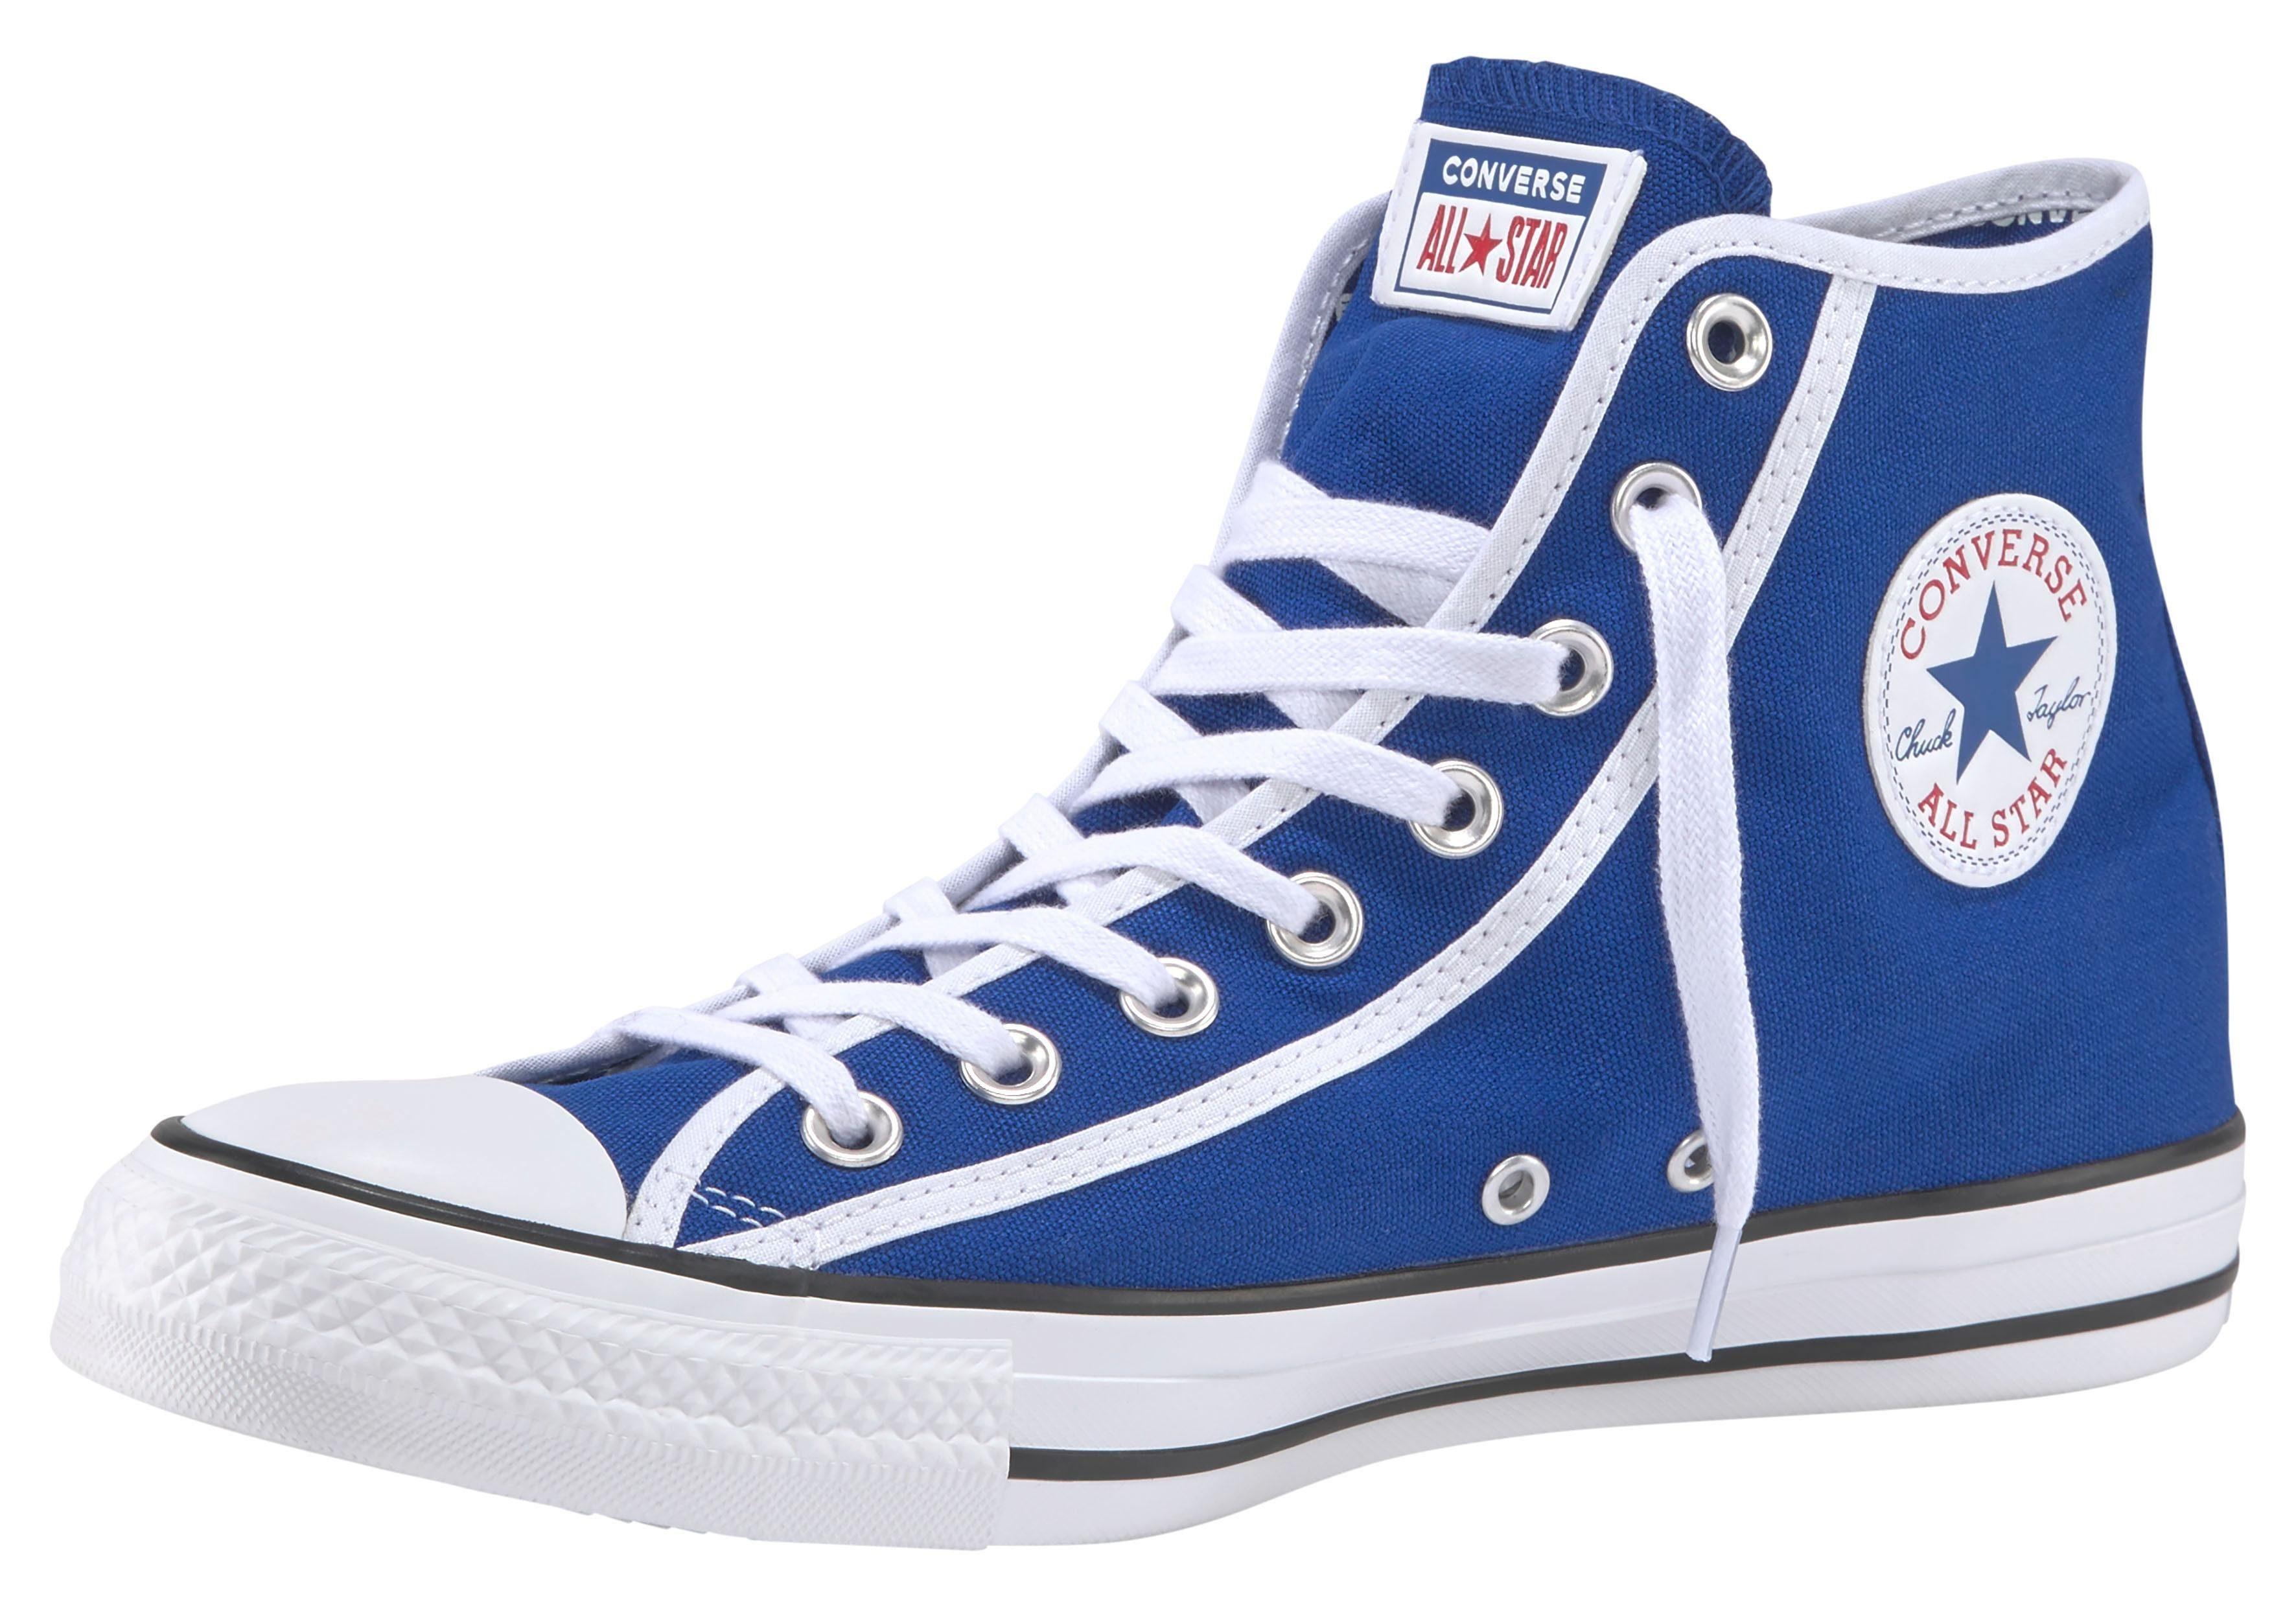 Converse »Chuck Taylor All Star Hi« Sneaker kaufen | OTTO